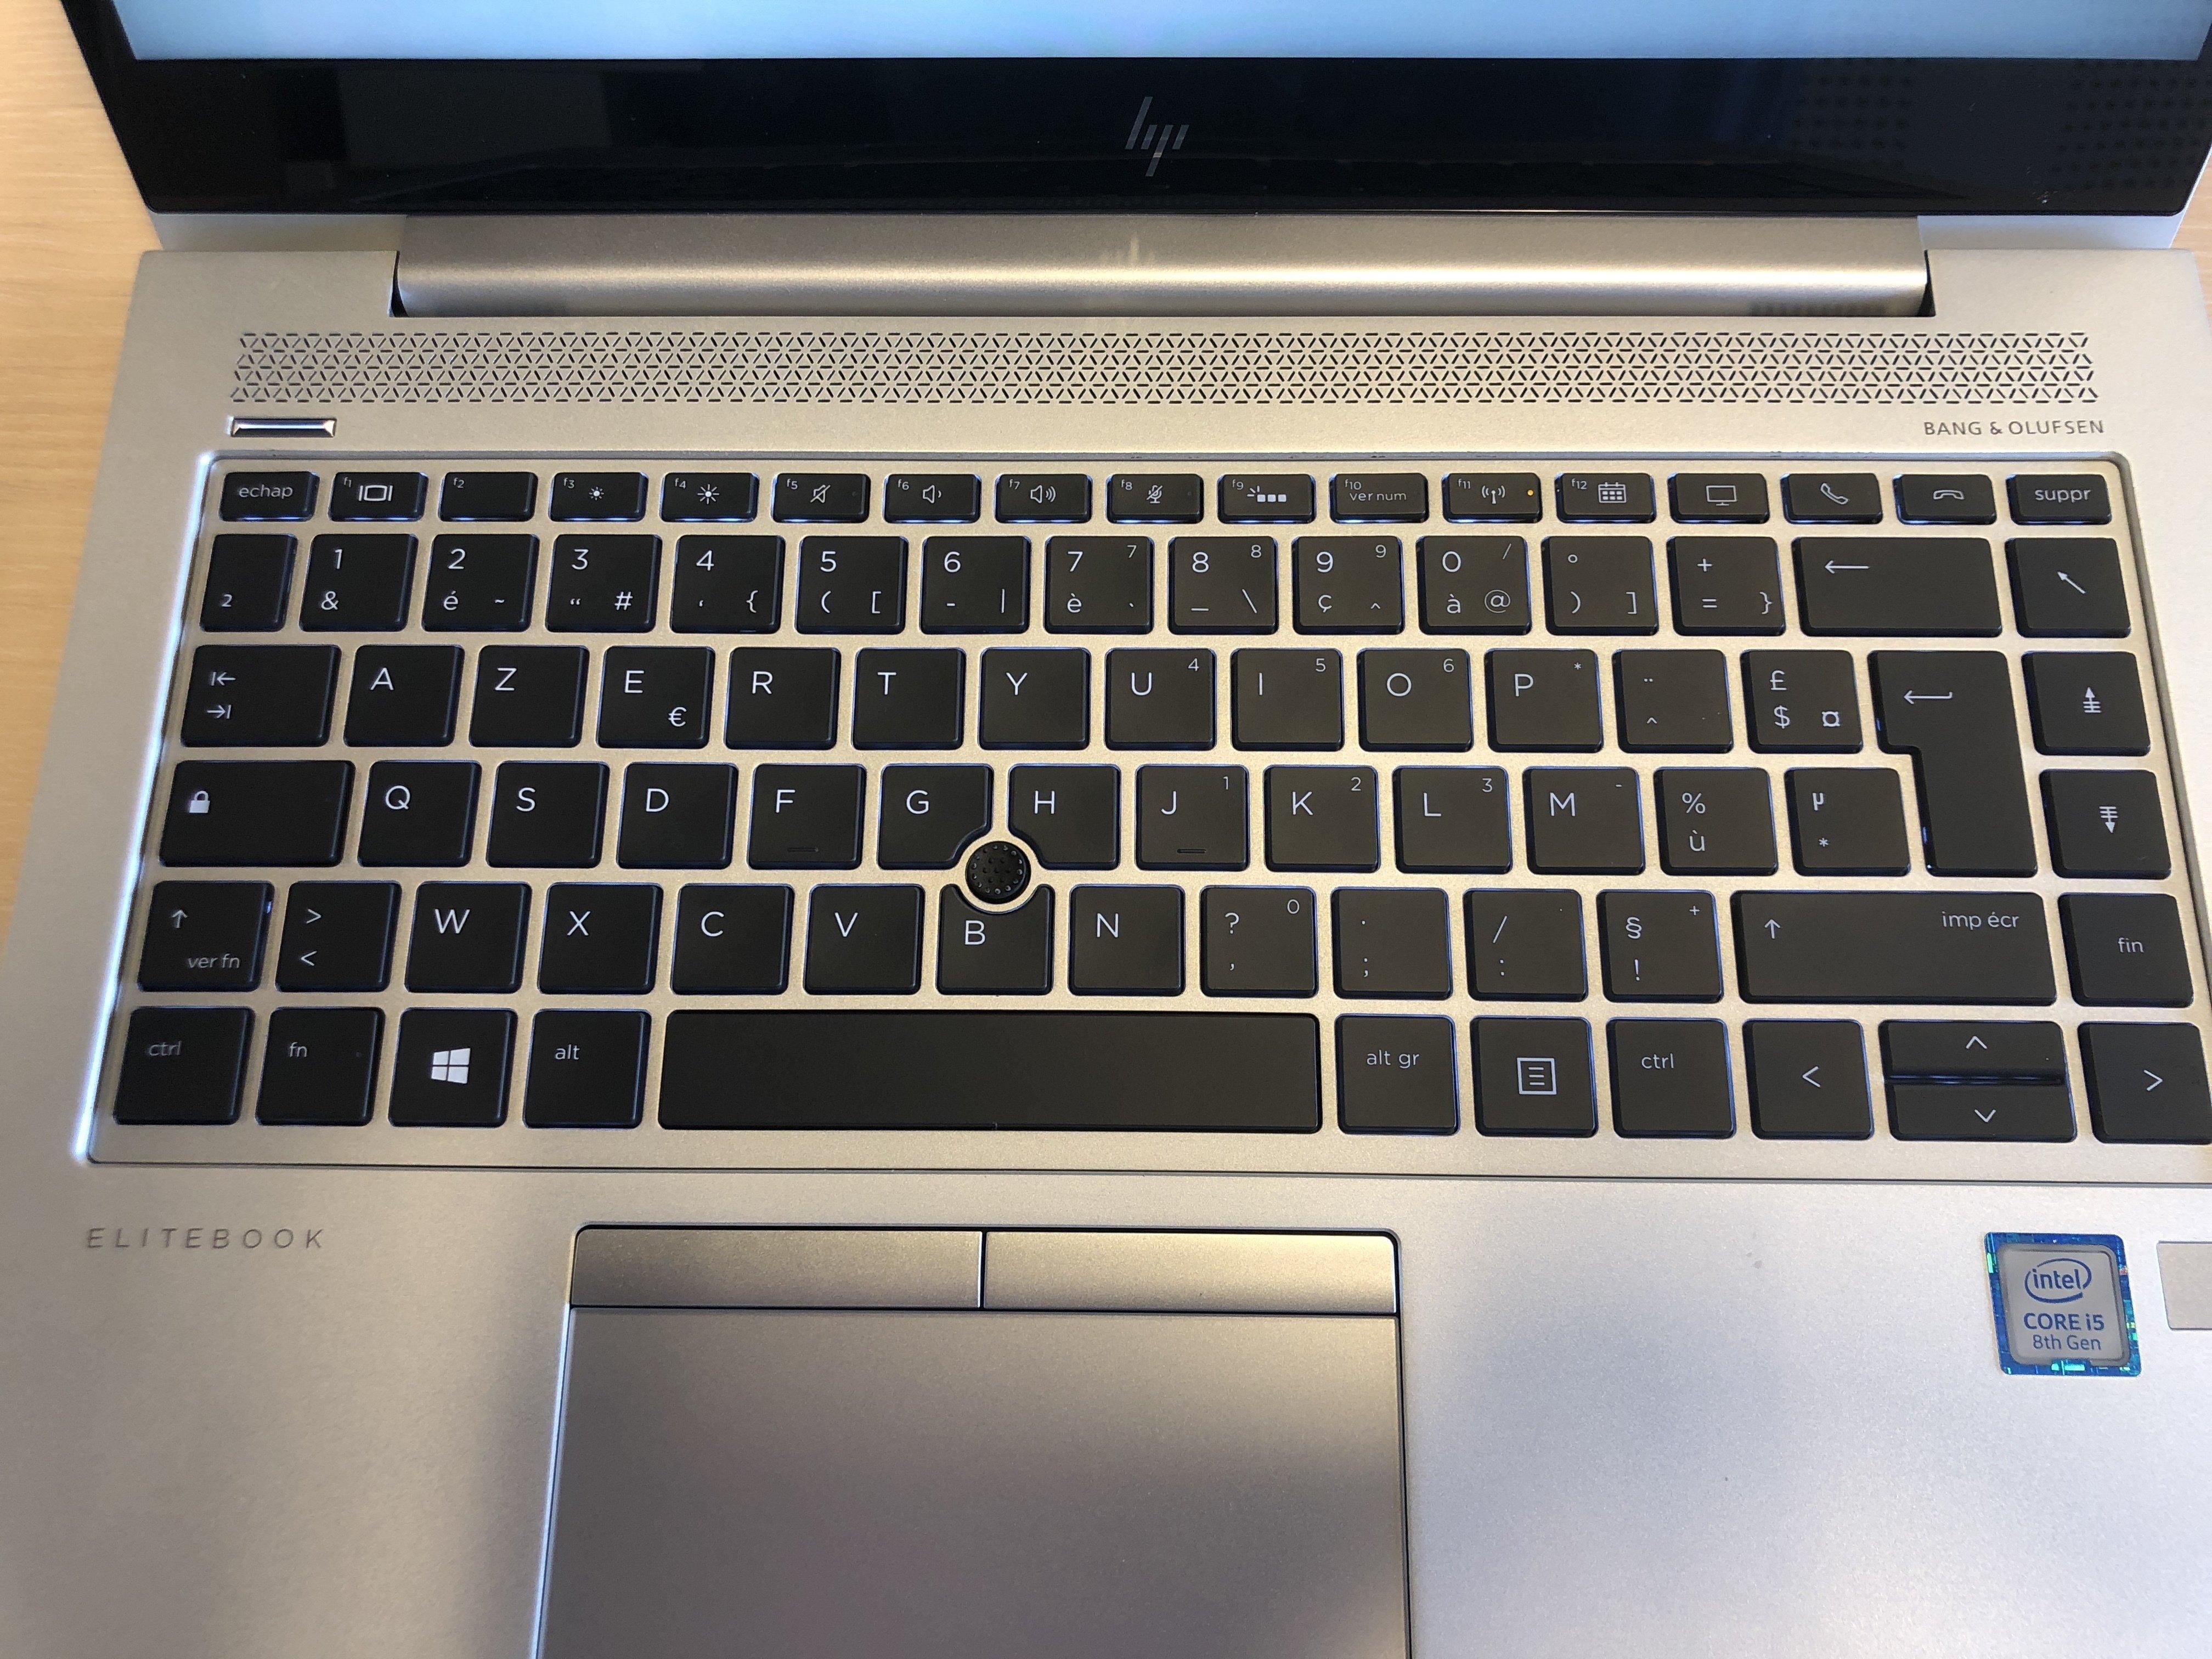 HP EliteBook 840 G5 Keyboard Replacement - iFixit Repair Guide